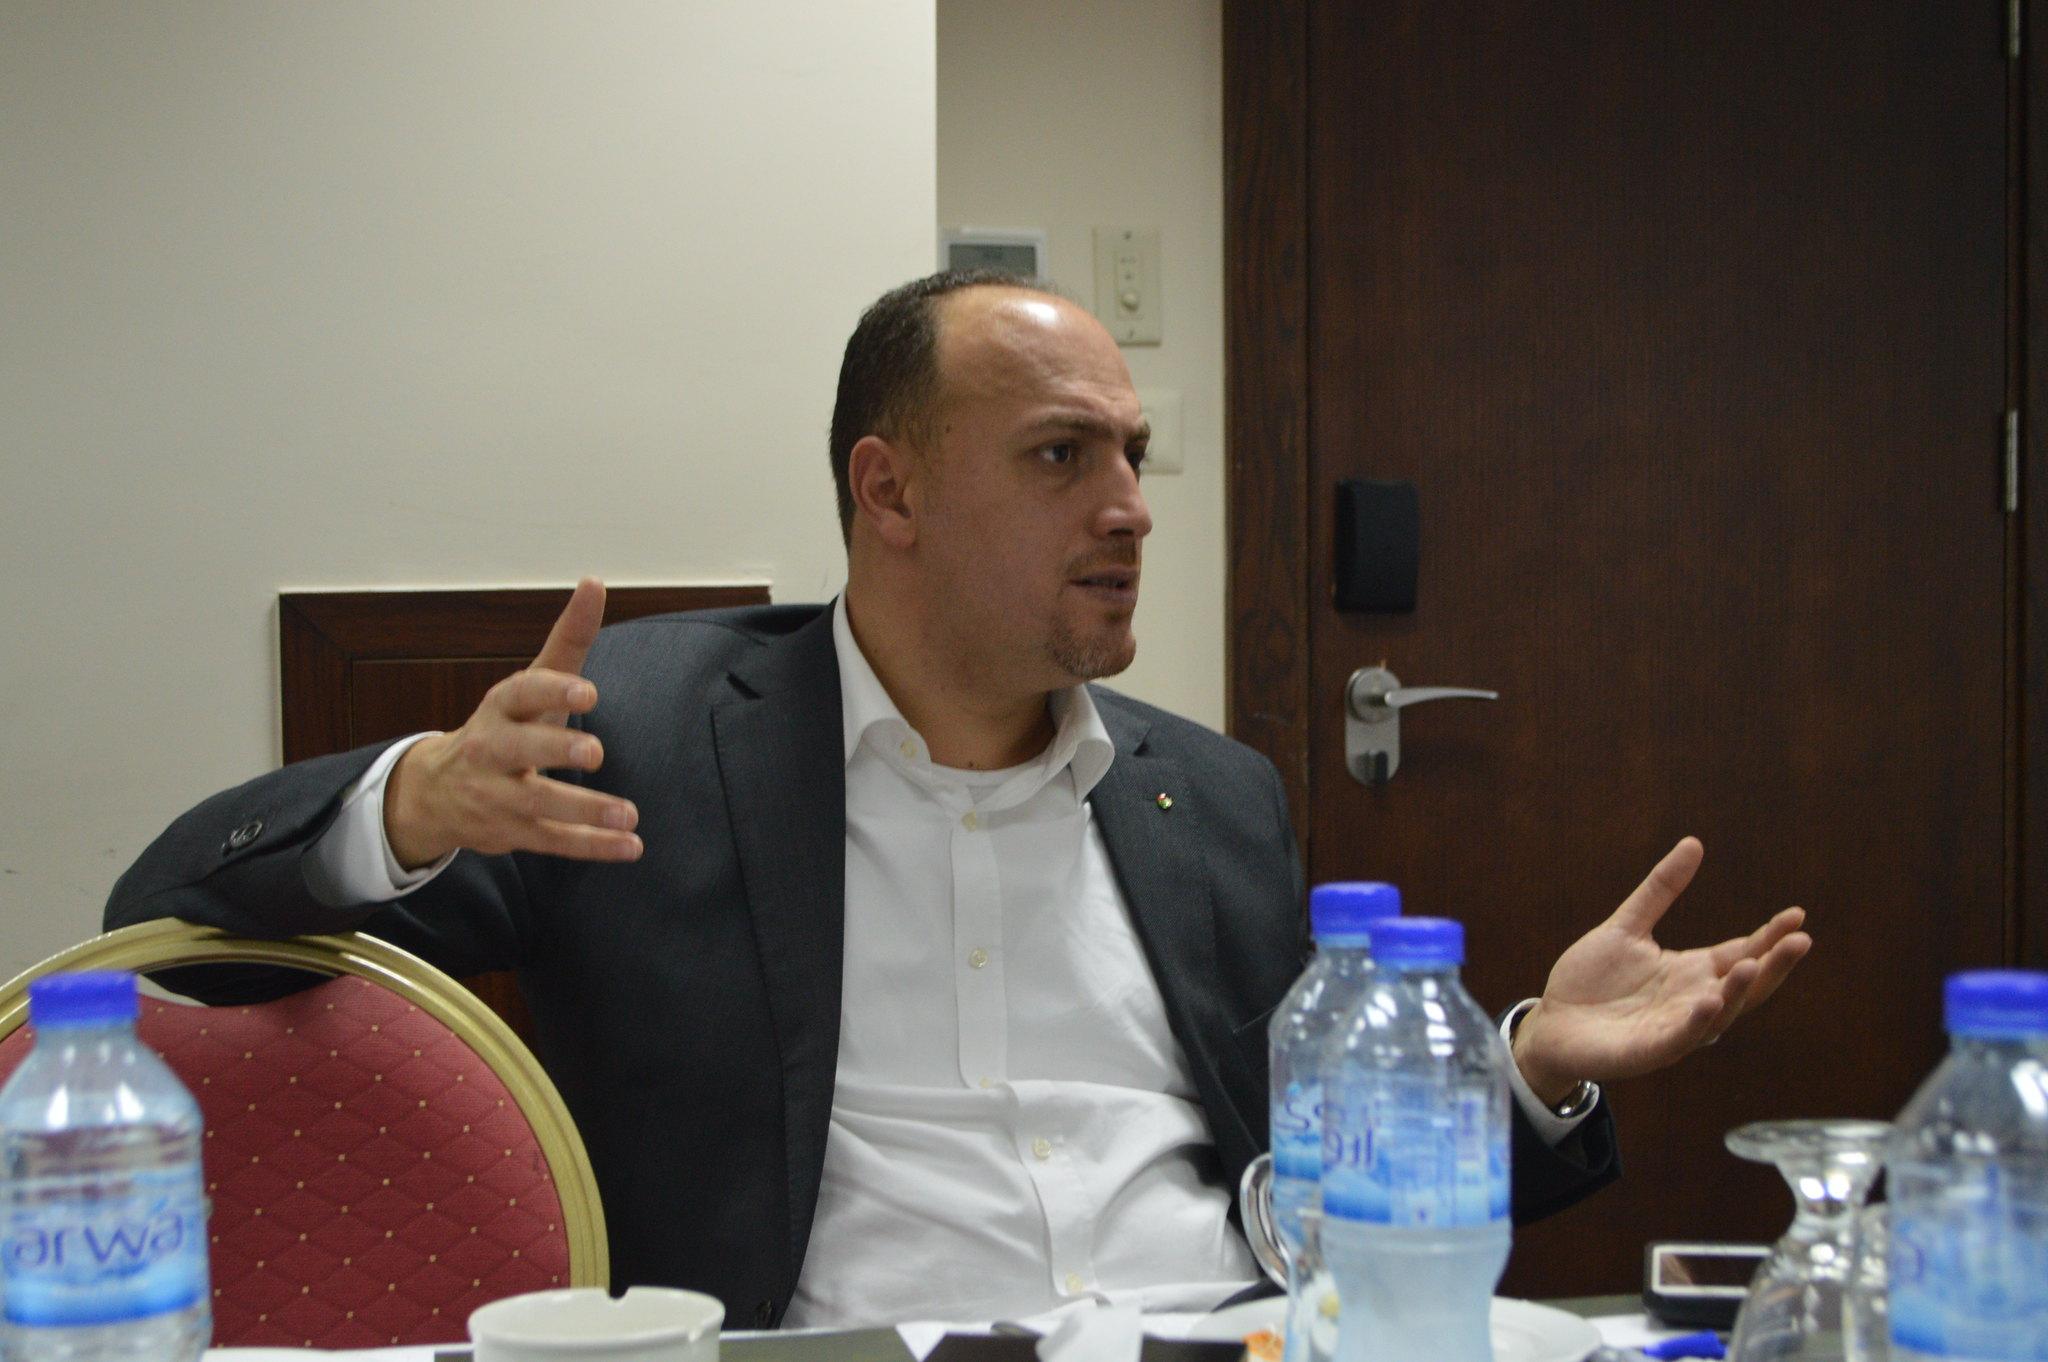 Husam Zumlot